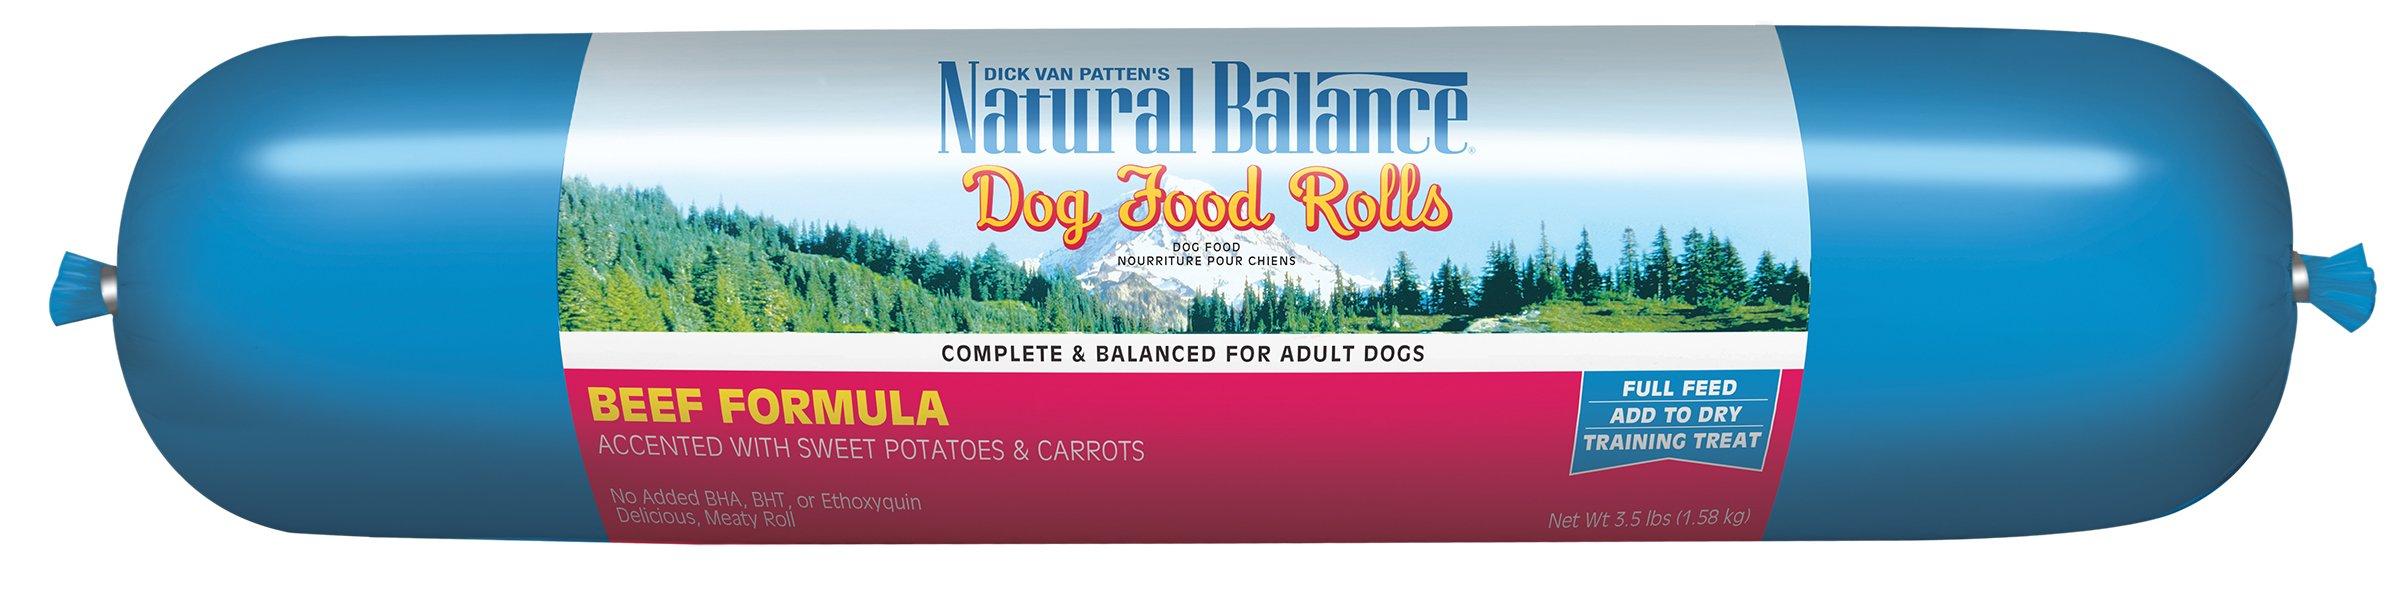 Reviews On Natural Balance Dog Food Rolls